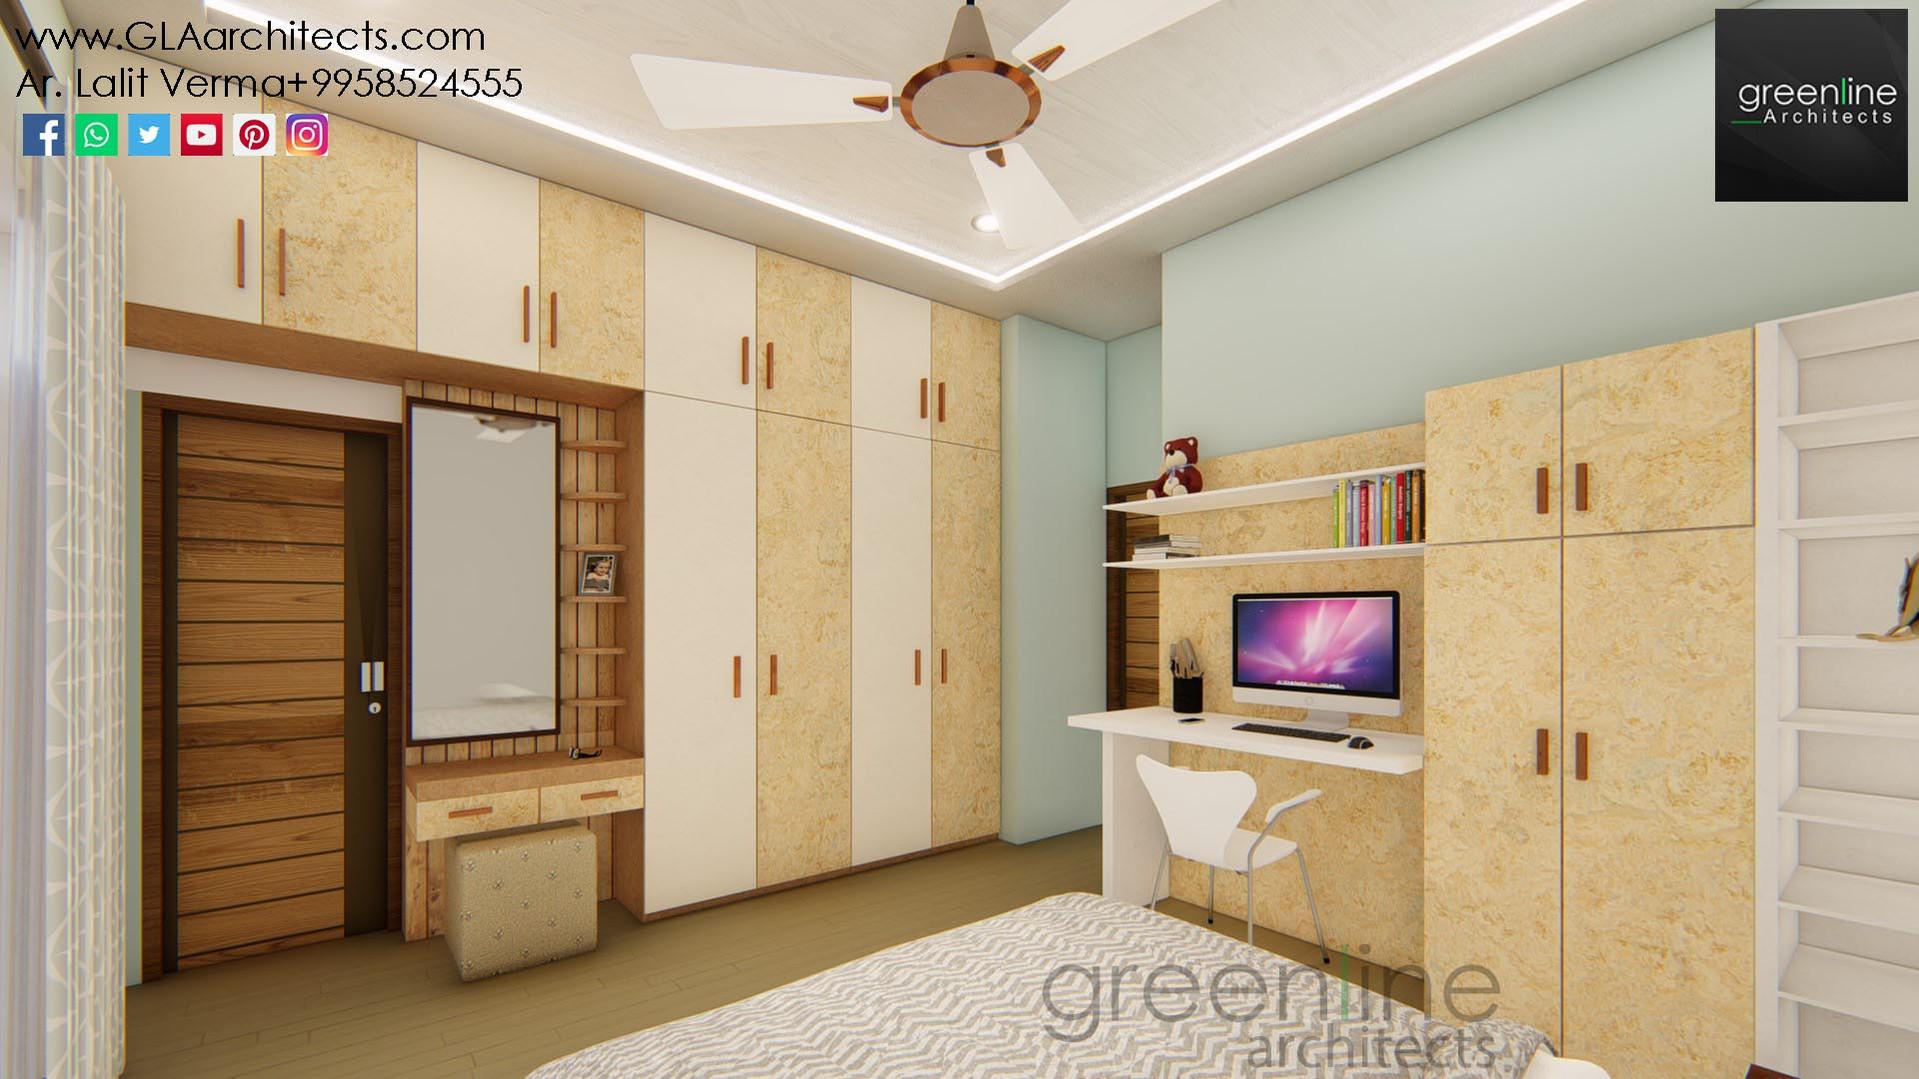 3 BHK-Apartment_Home Interior (16).jpg